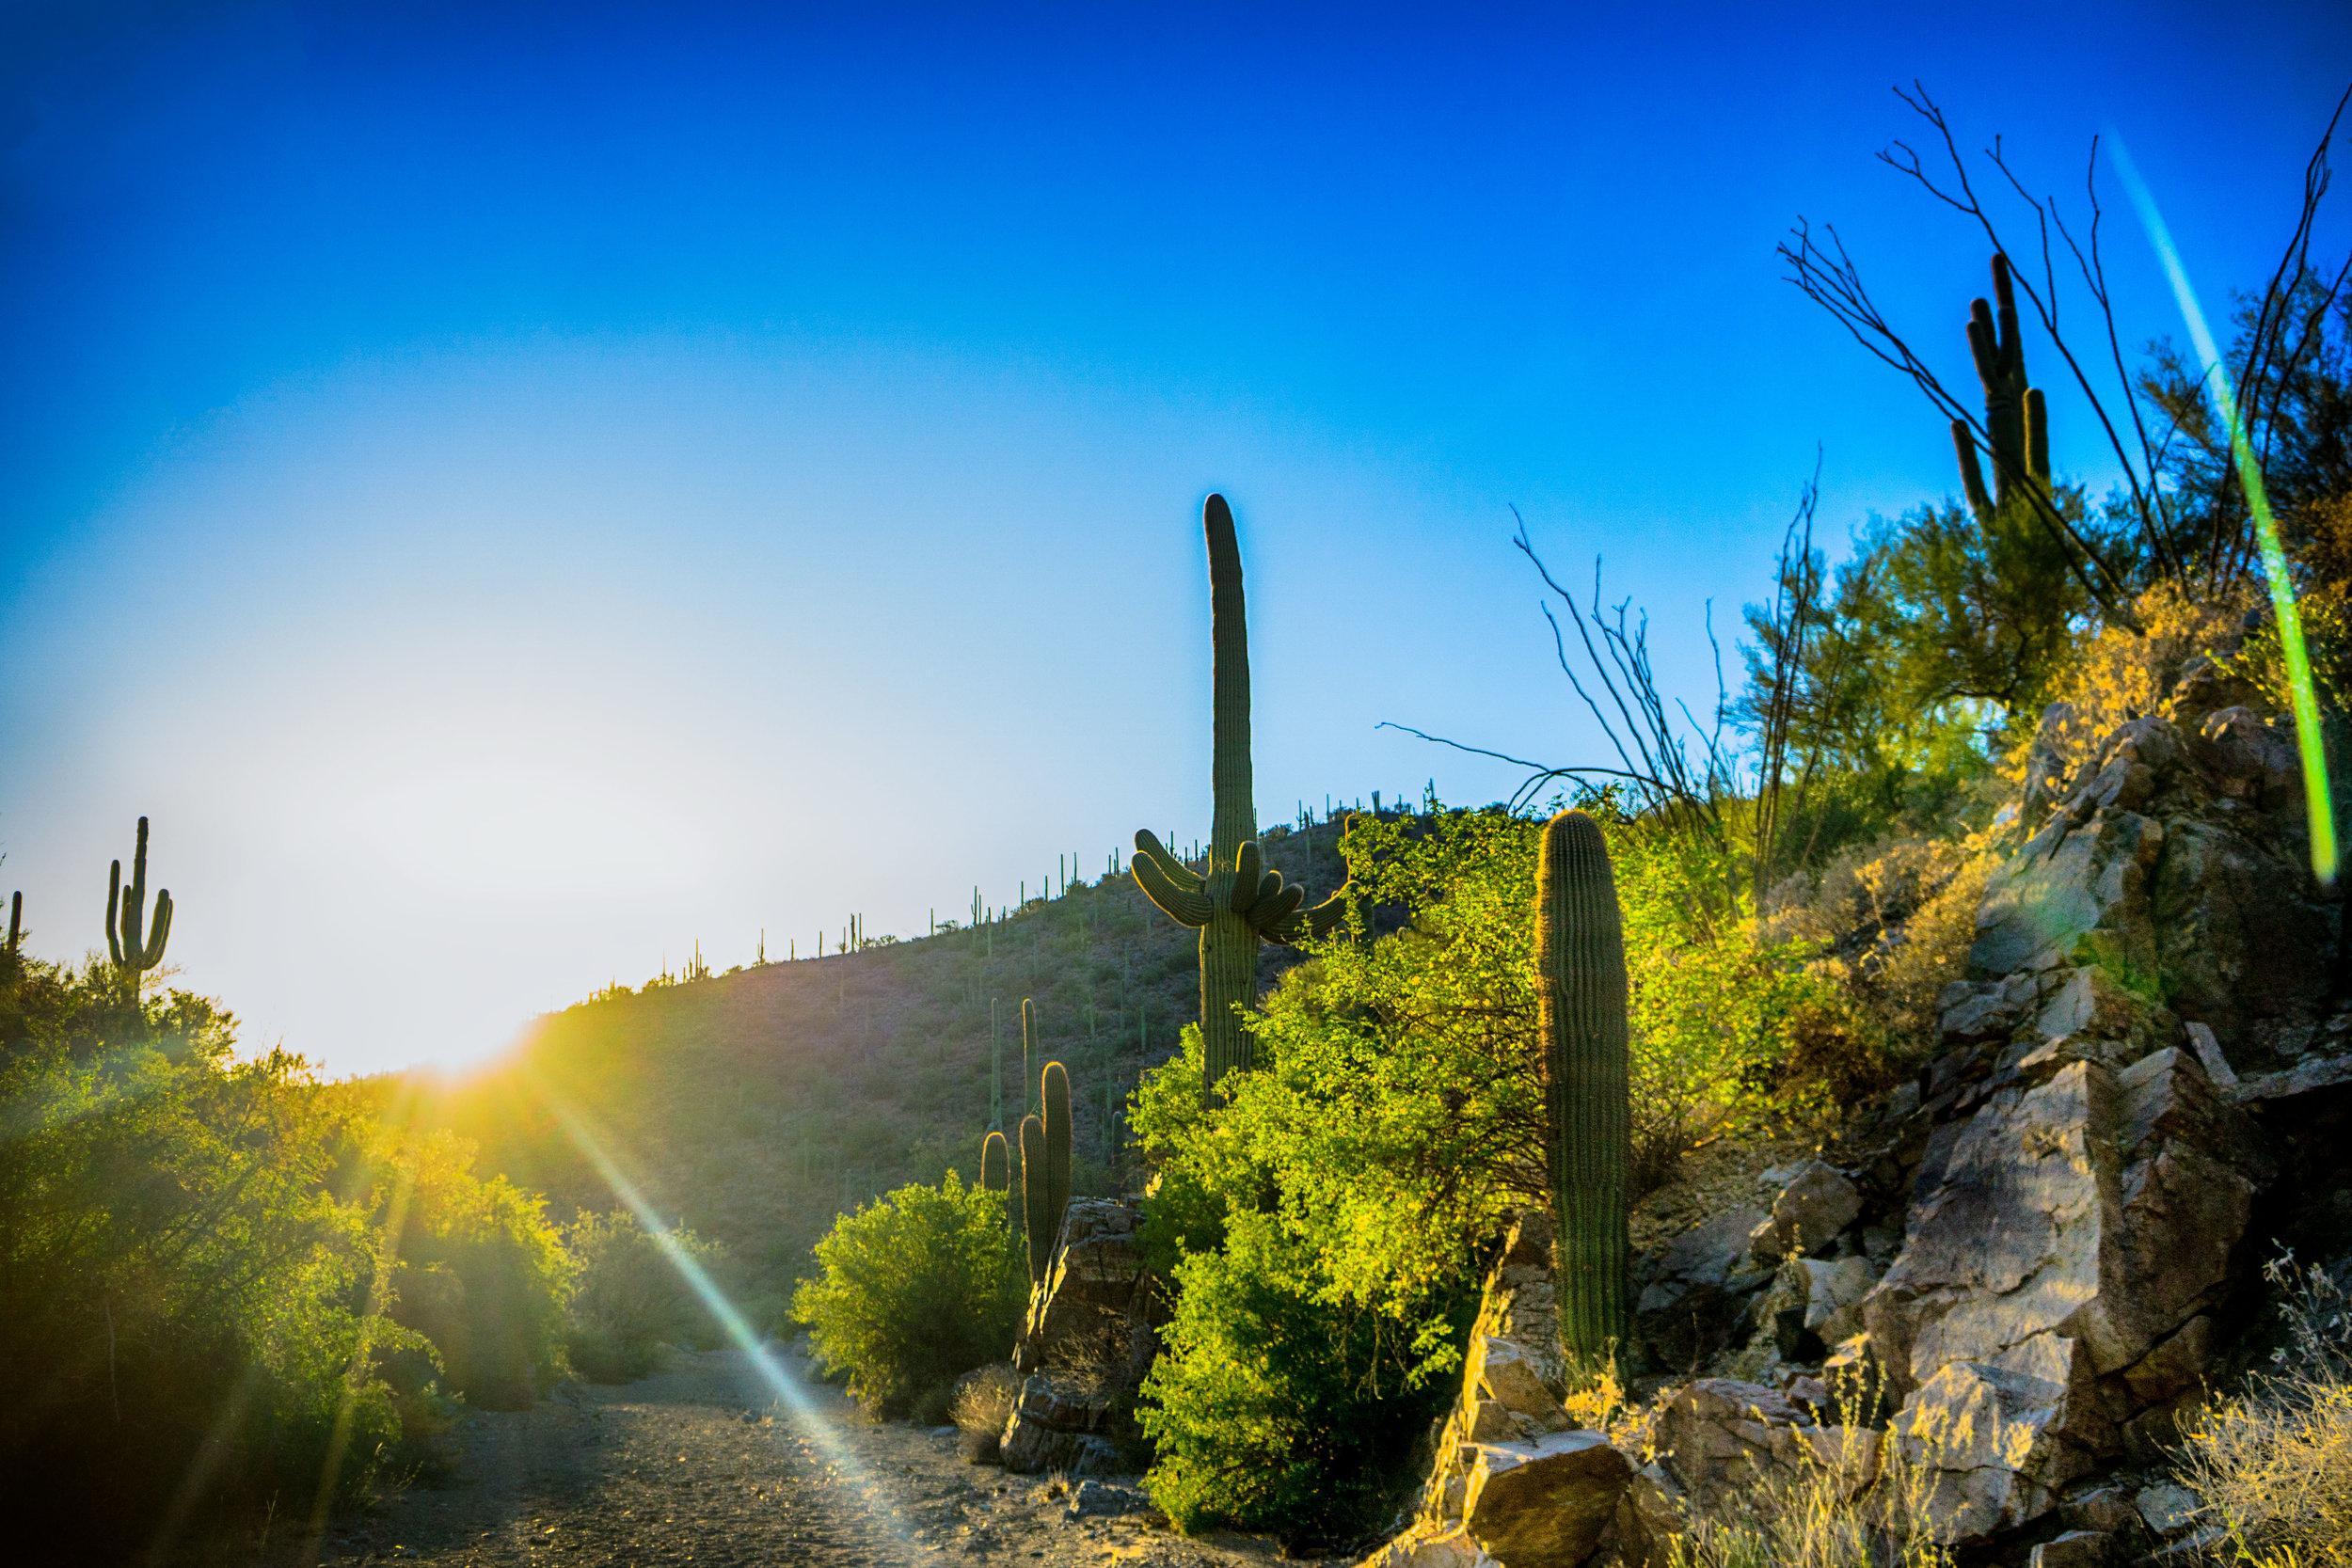 vickygood_photography_nature_saguaro-park3.jpg